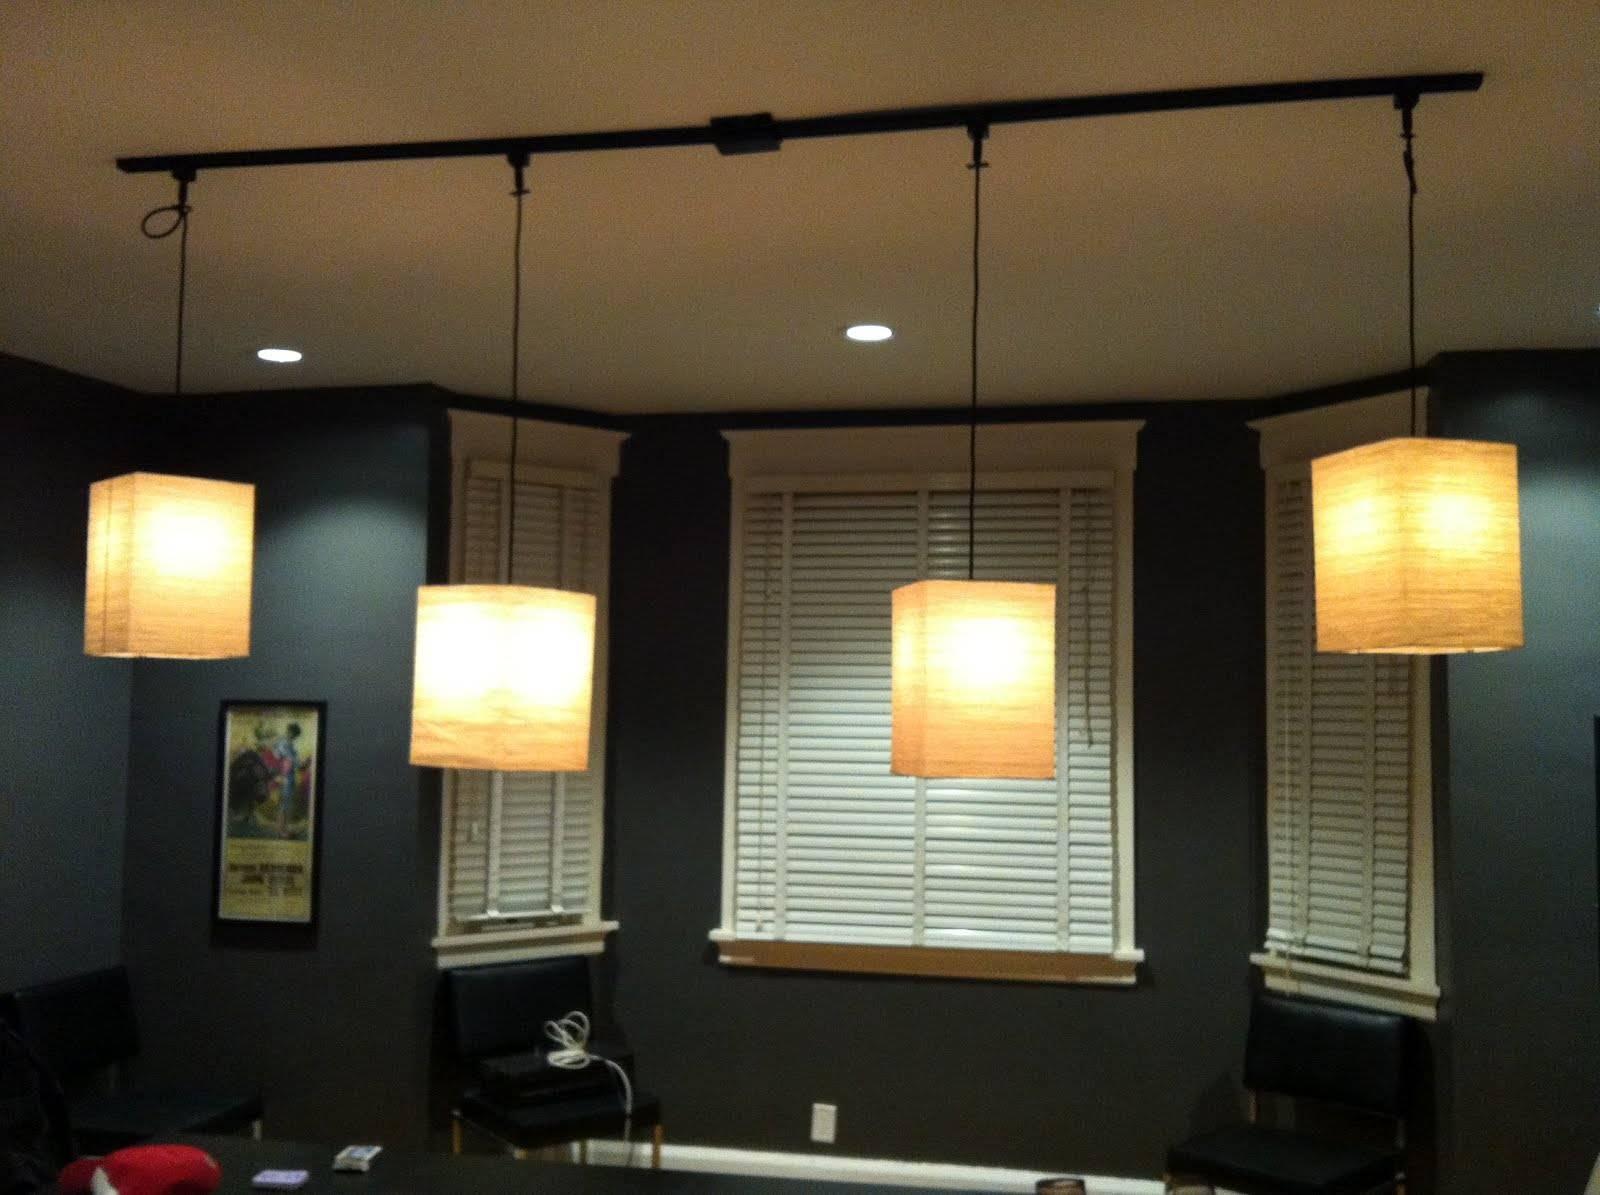 Ceiling Lights : Stunning Track Lighting Pendant Exposed Bulb within Exposed Bulb Pendant Track Lighting (Image 8 of 15)